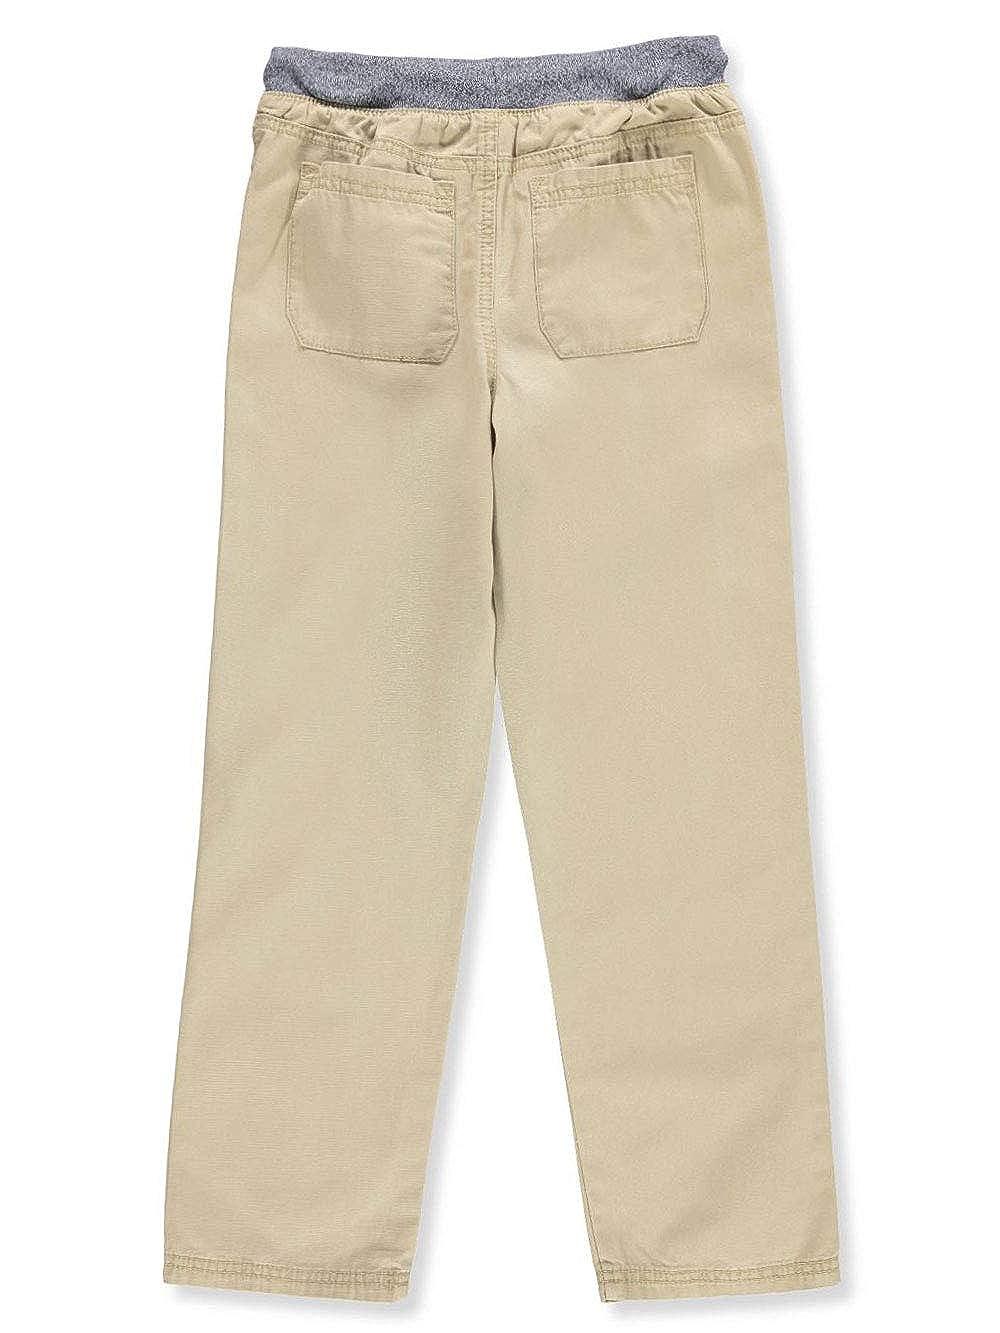 Carters Big Boys Twill Pants 8 Khaki